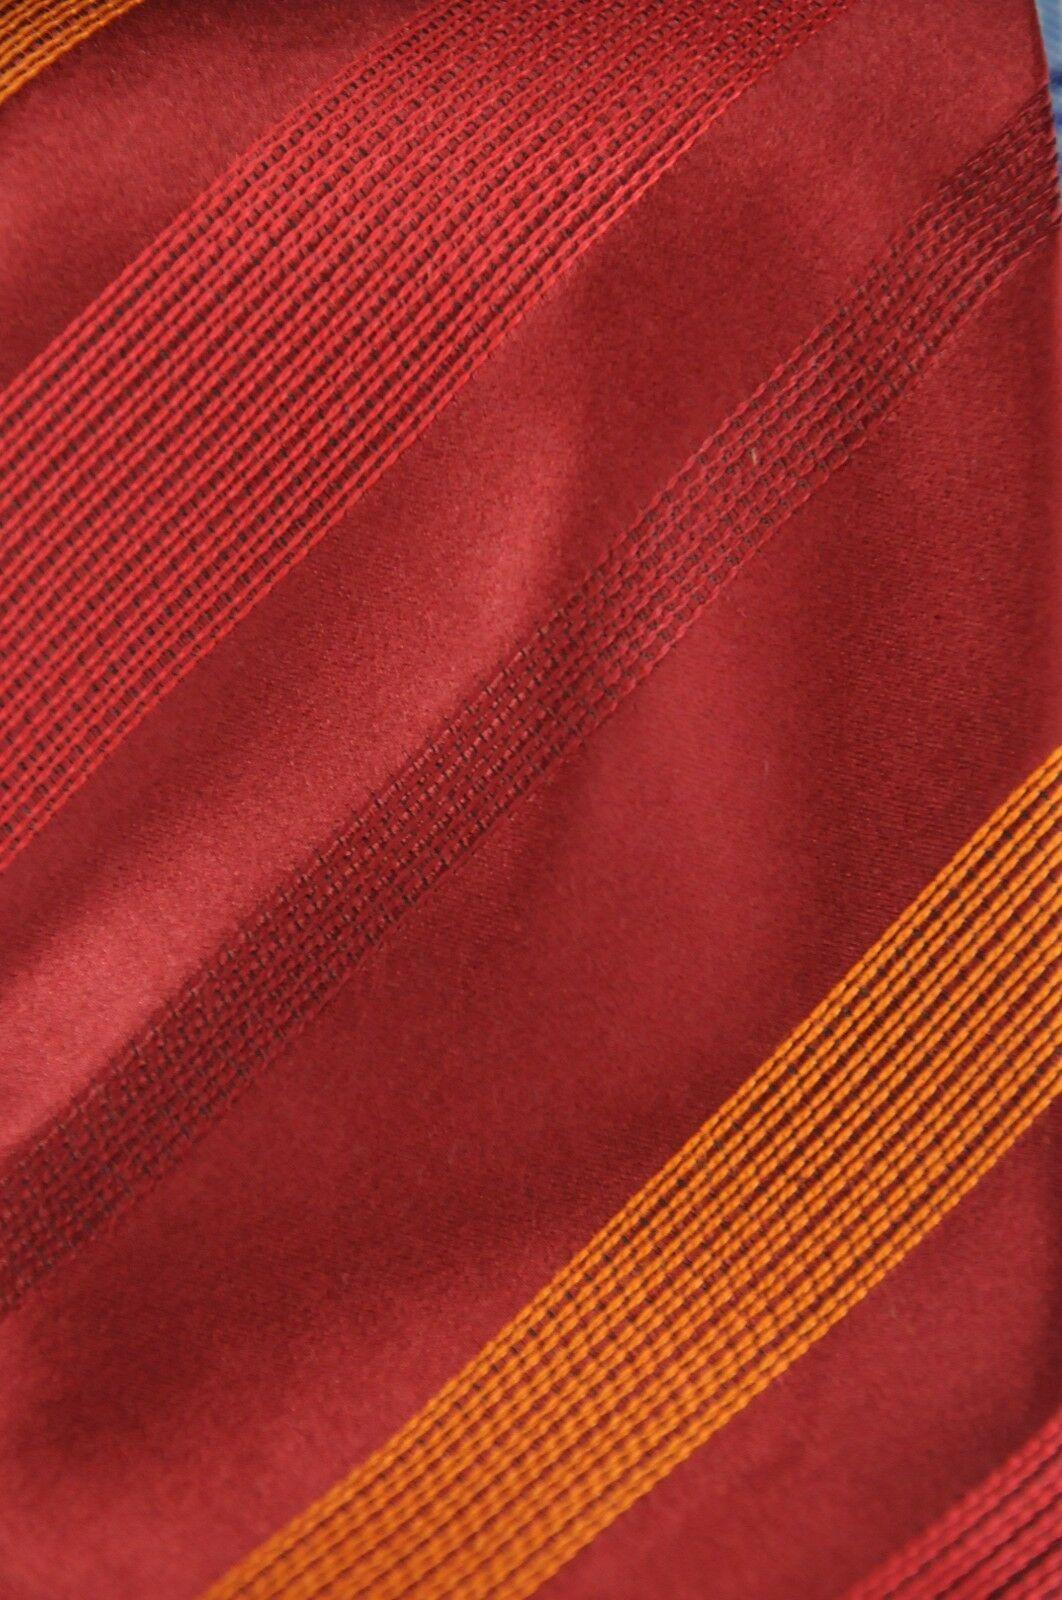 Kenneth Cole Men's Tie Ruby & Orange Striped Woven Silk Necktie 60 x 3.5 in. image 3